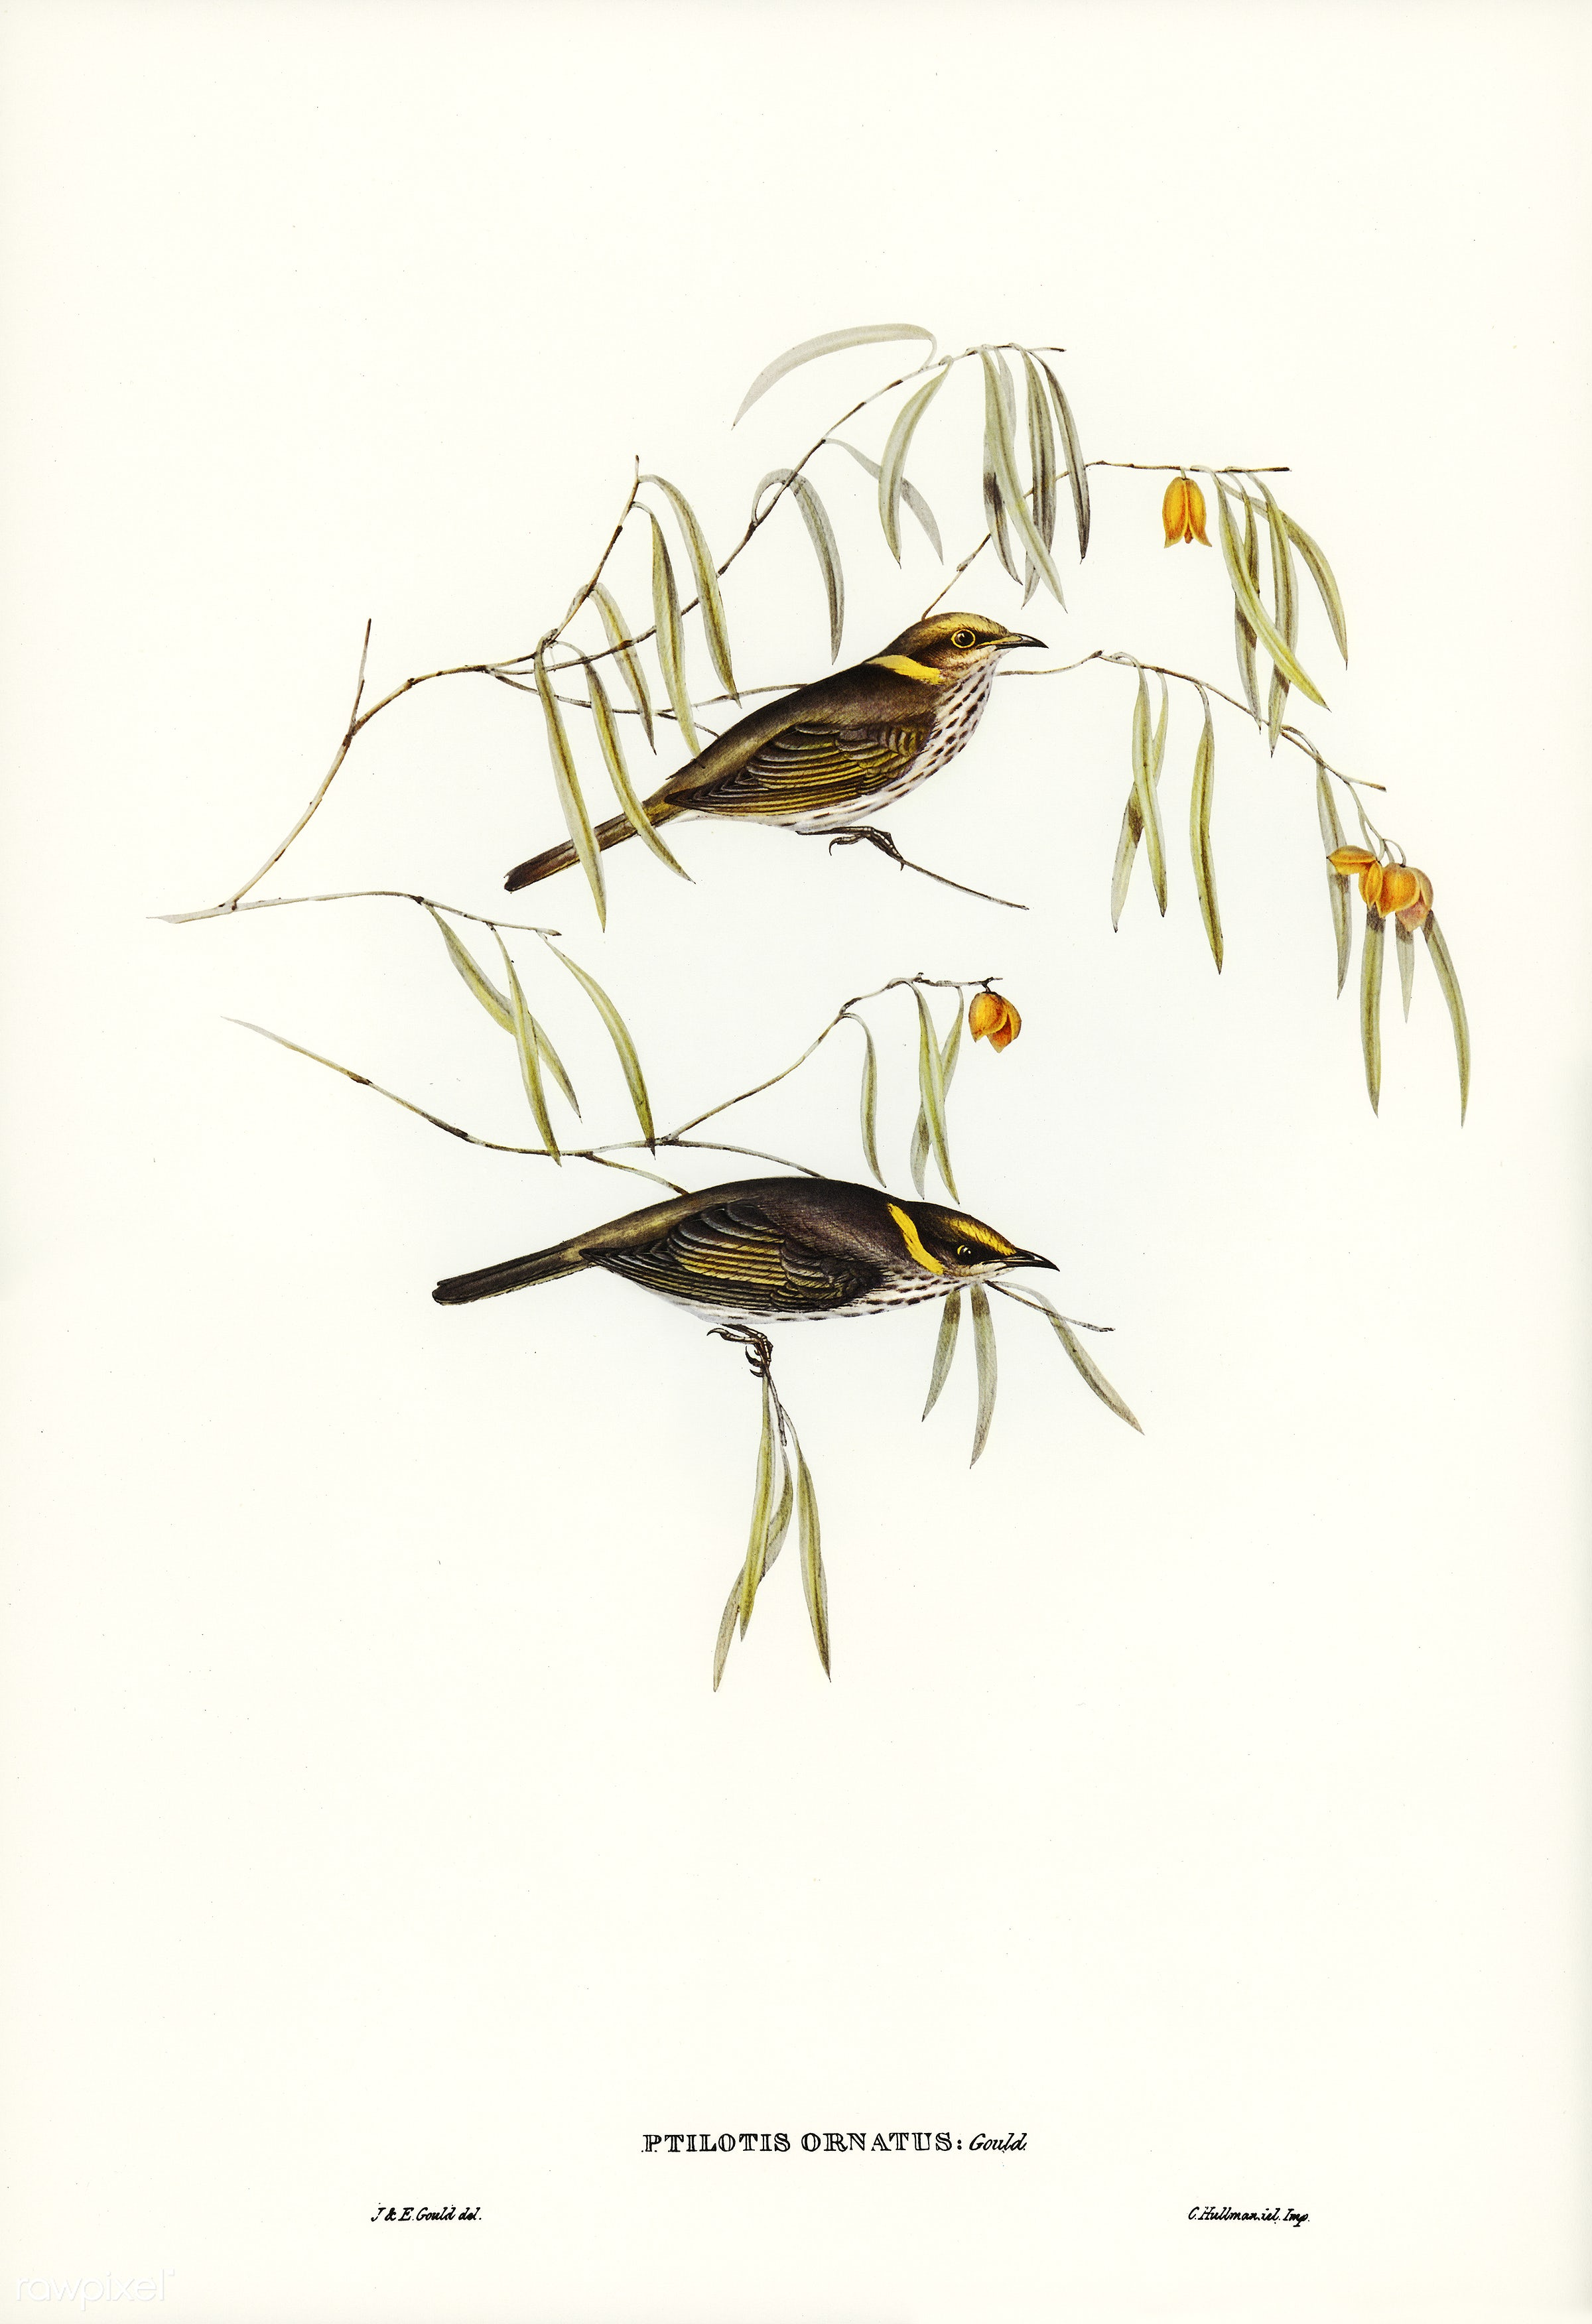 Graceful Honey-eater (Ptilotis ornatus) illustrated by Elizabeth Gould (1804–1841) for John Gould's (1804-1881)...